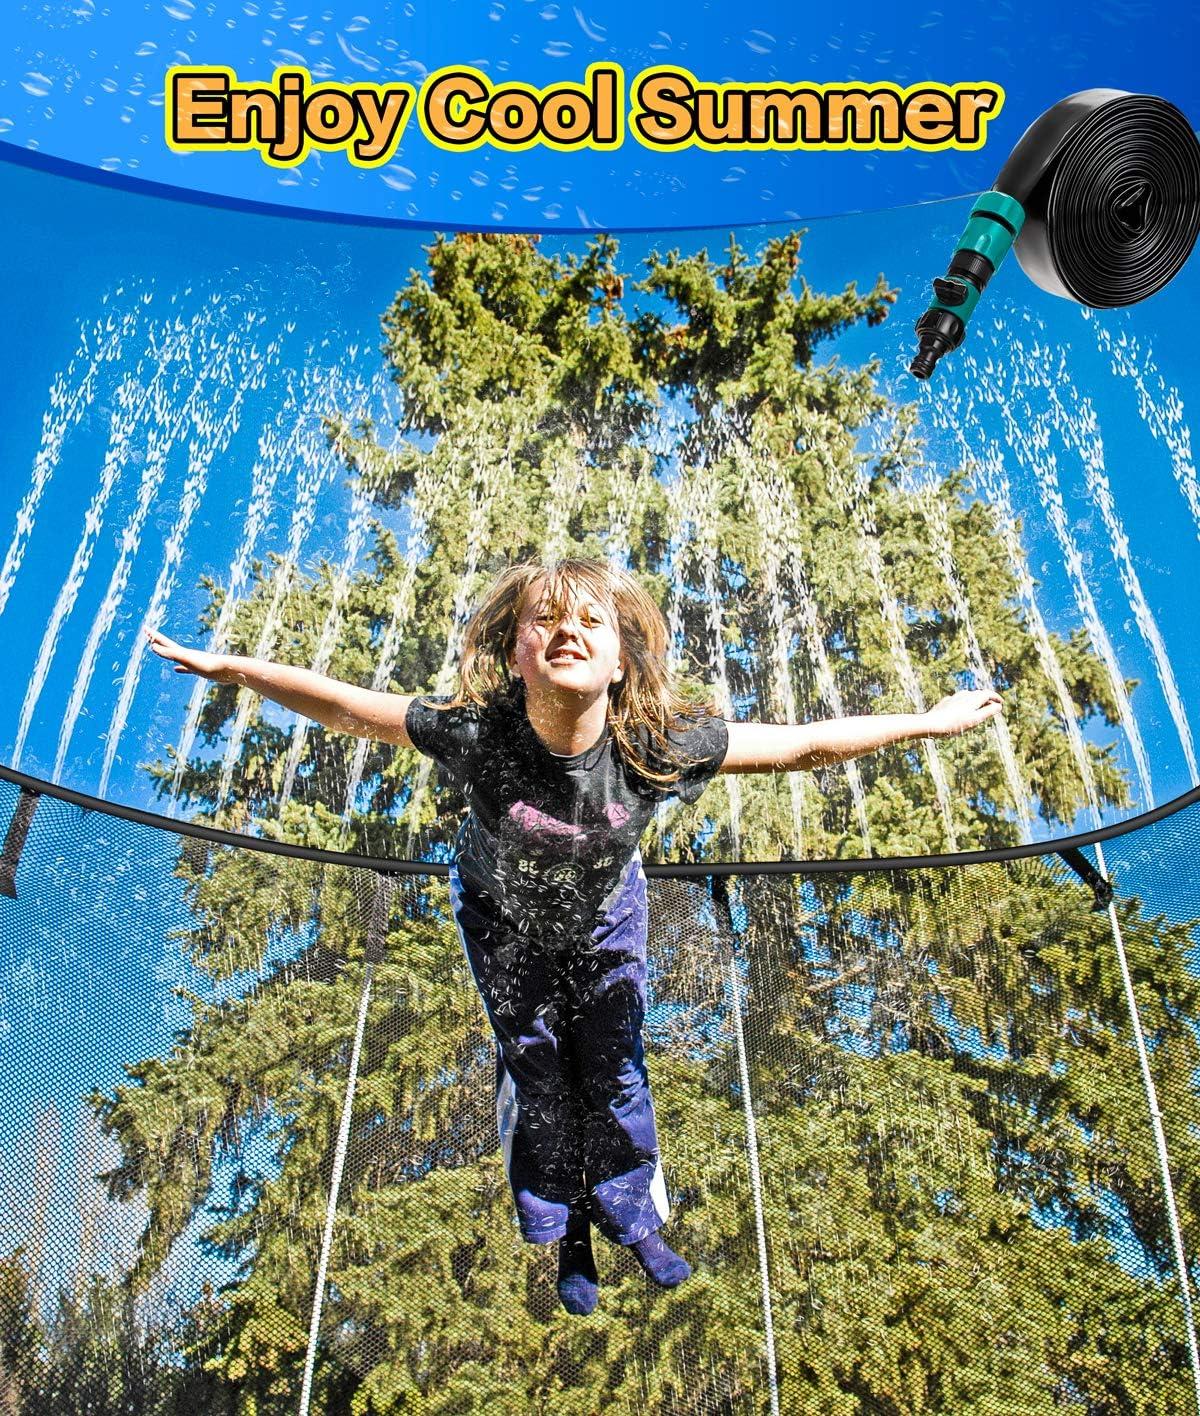 BMAG Trampoline Sprinkler, Party Outdoor Trampoline Sprinkler Water Park for Kids, Fun Cooling Summer Sprinkler Yard Games Water Toys, Backyard Water Park Sprinkler for Boys and Girls 39 ft